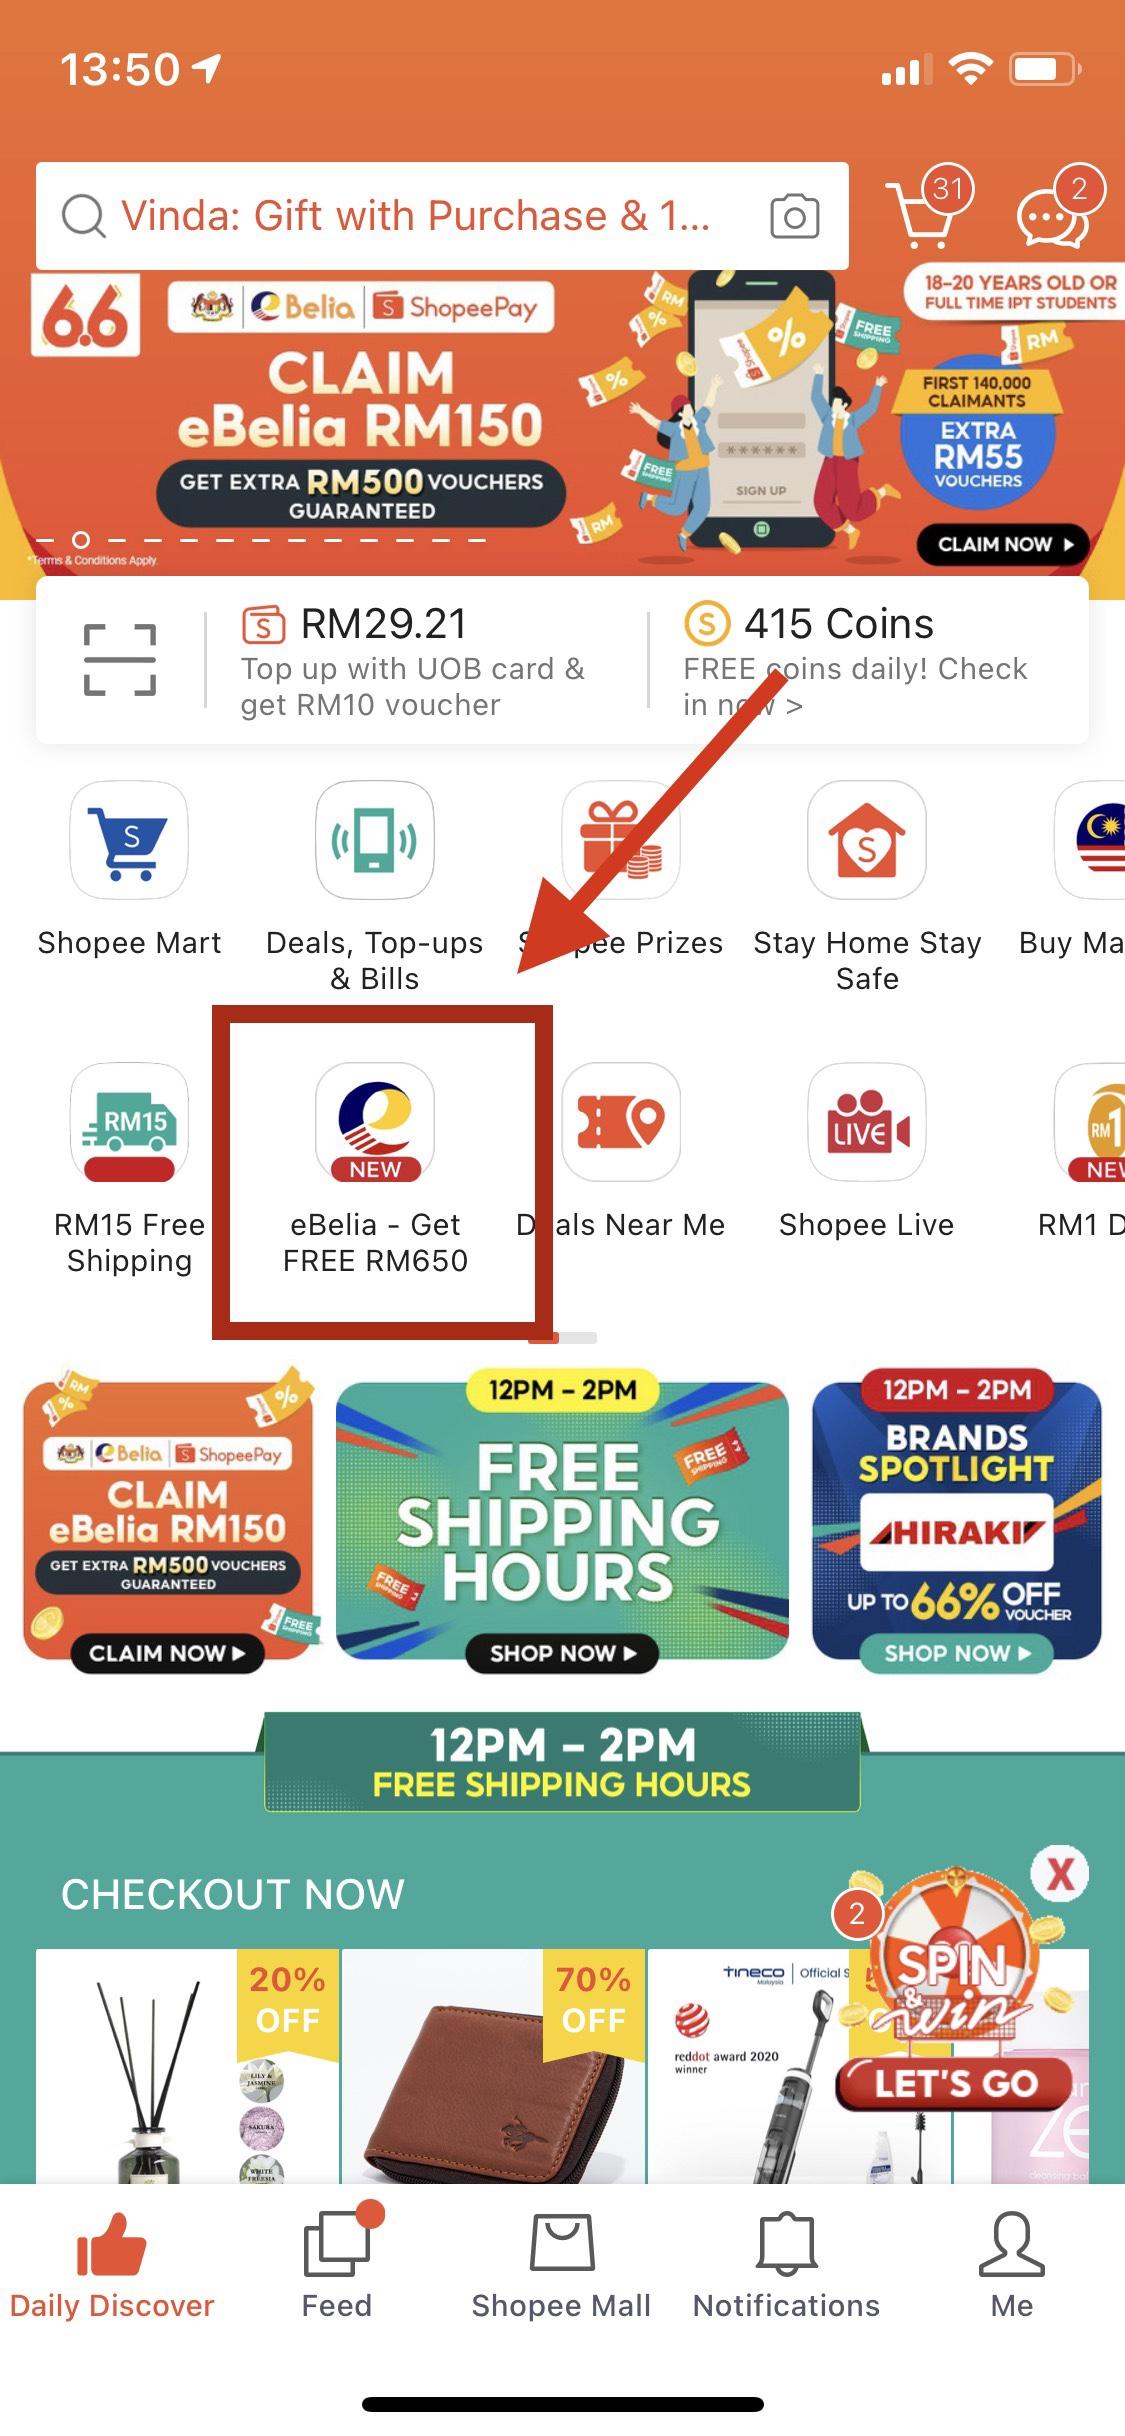 Source: ShopeePay Malaysia/Press release